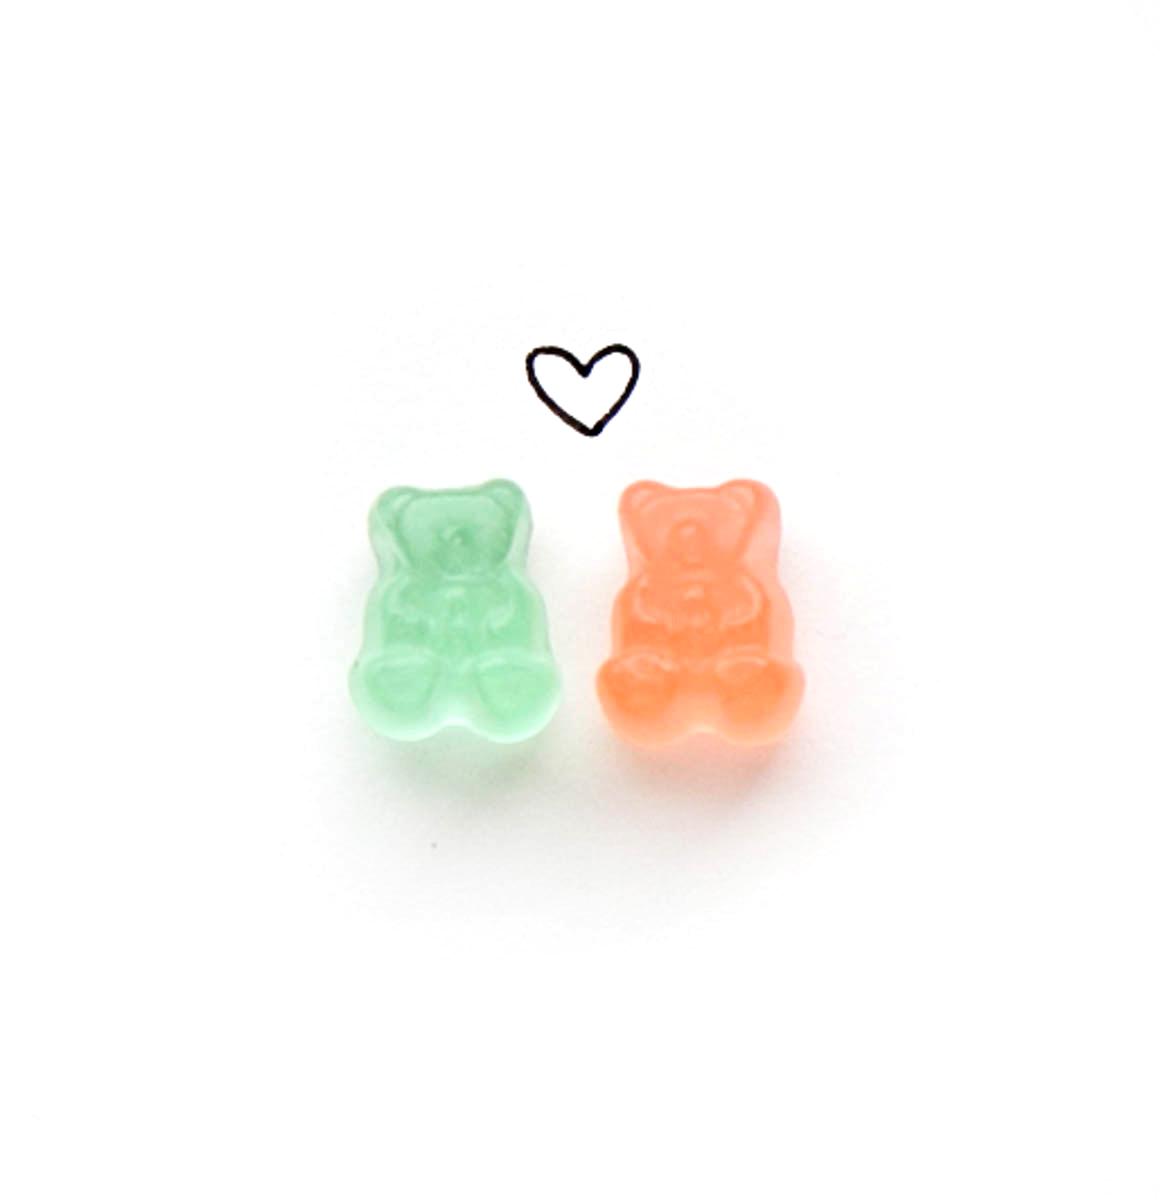 karla_diaz_cano_conceptual-gummy-1.jpg